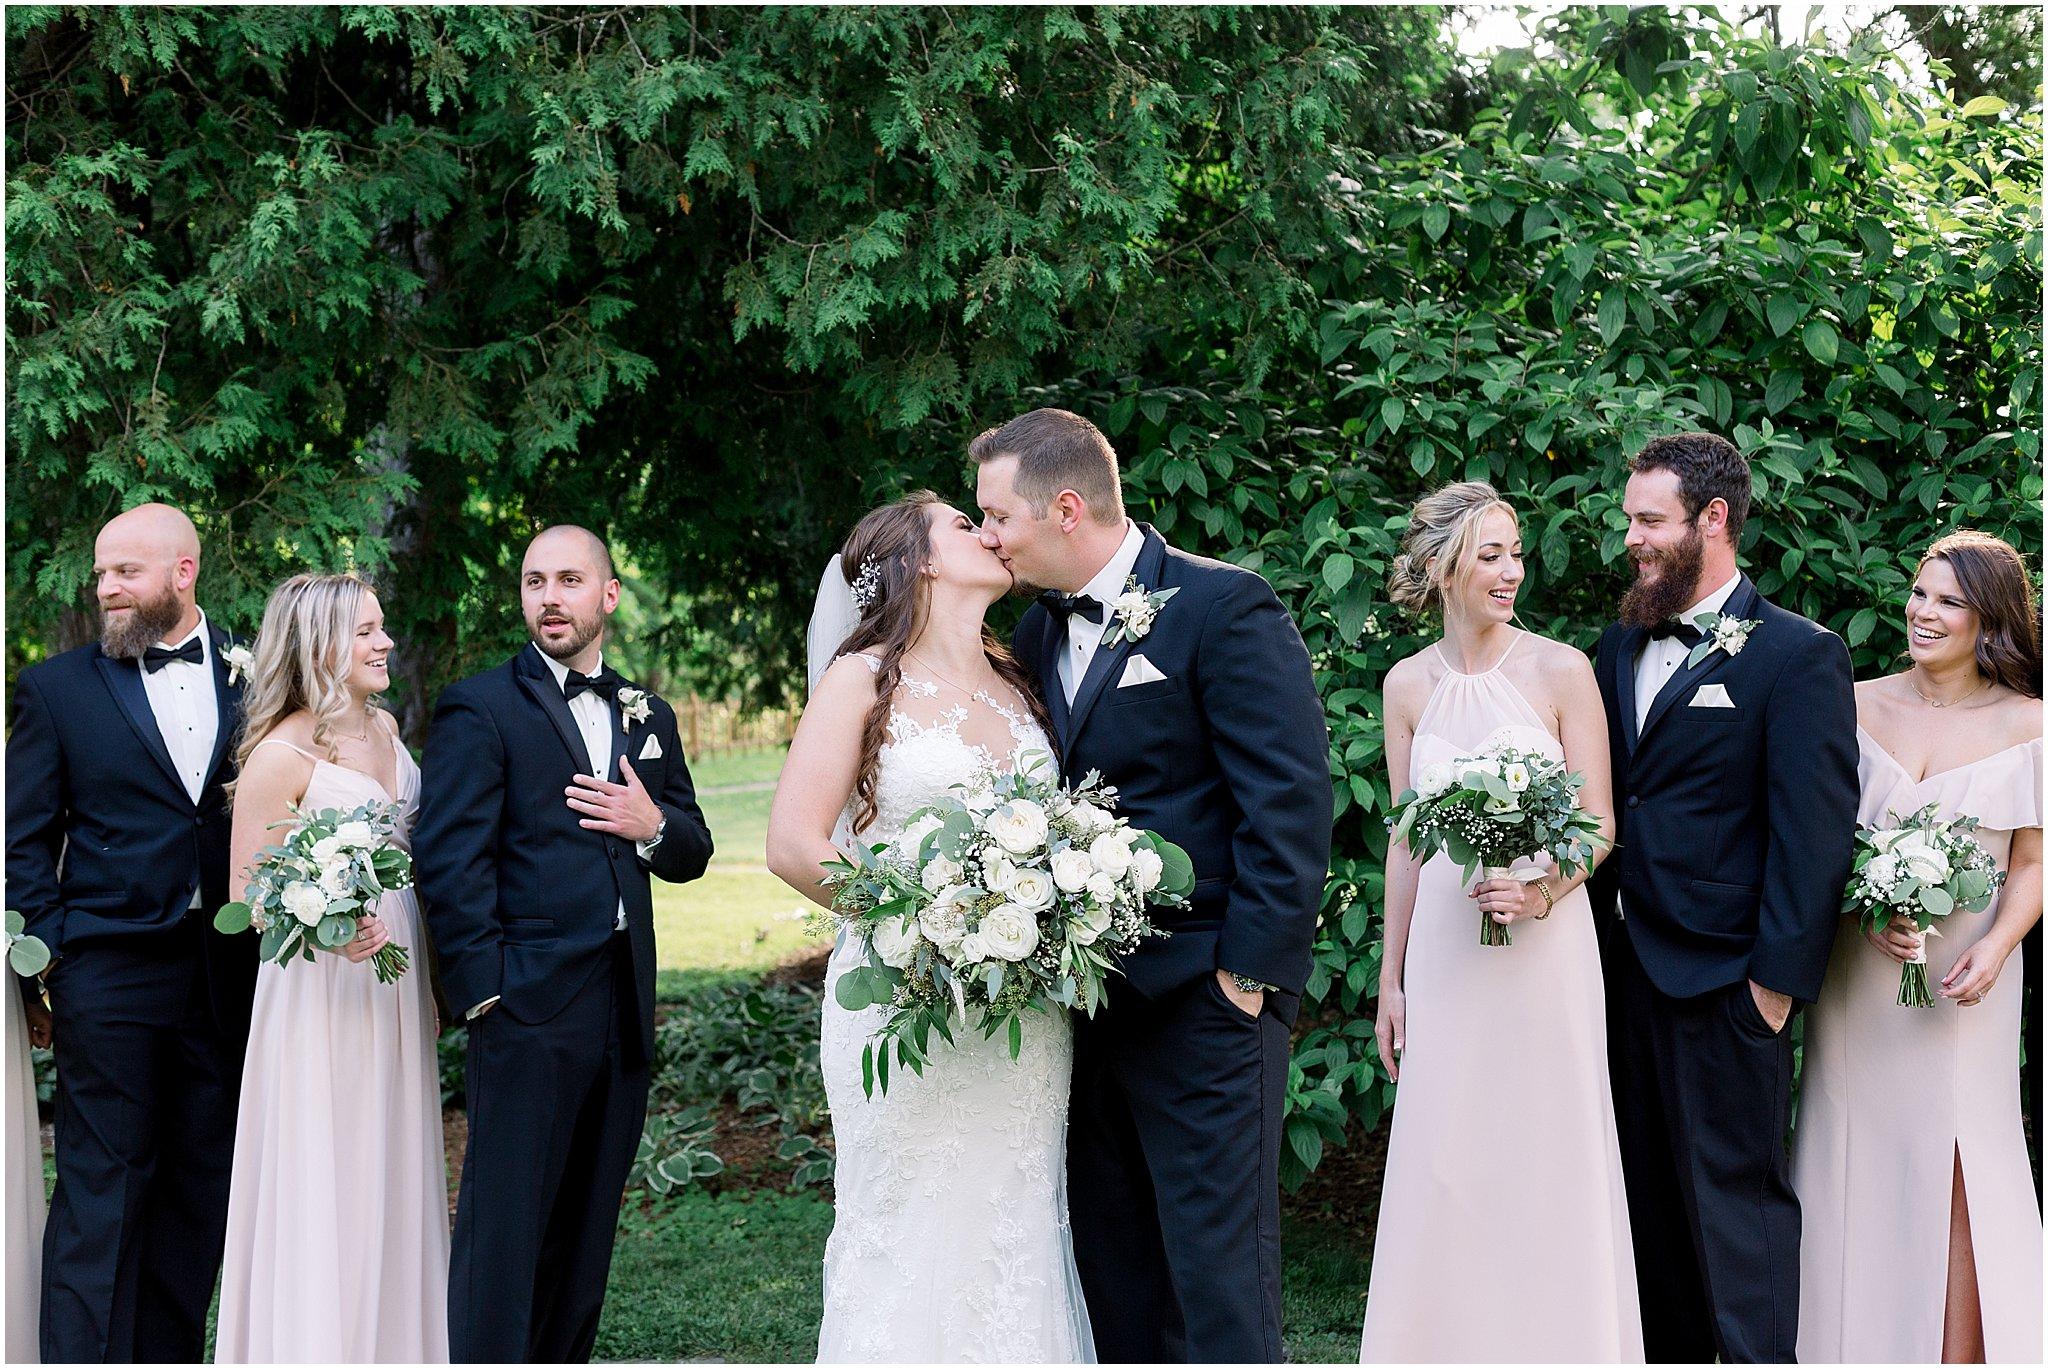 company-251-summer-chicago-wedding-photos_0031.jpg